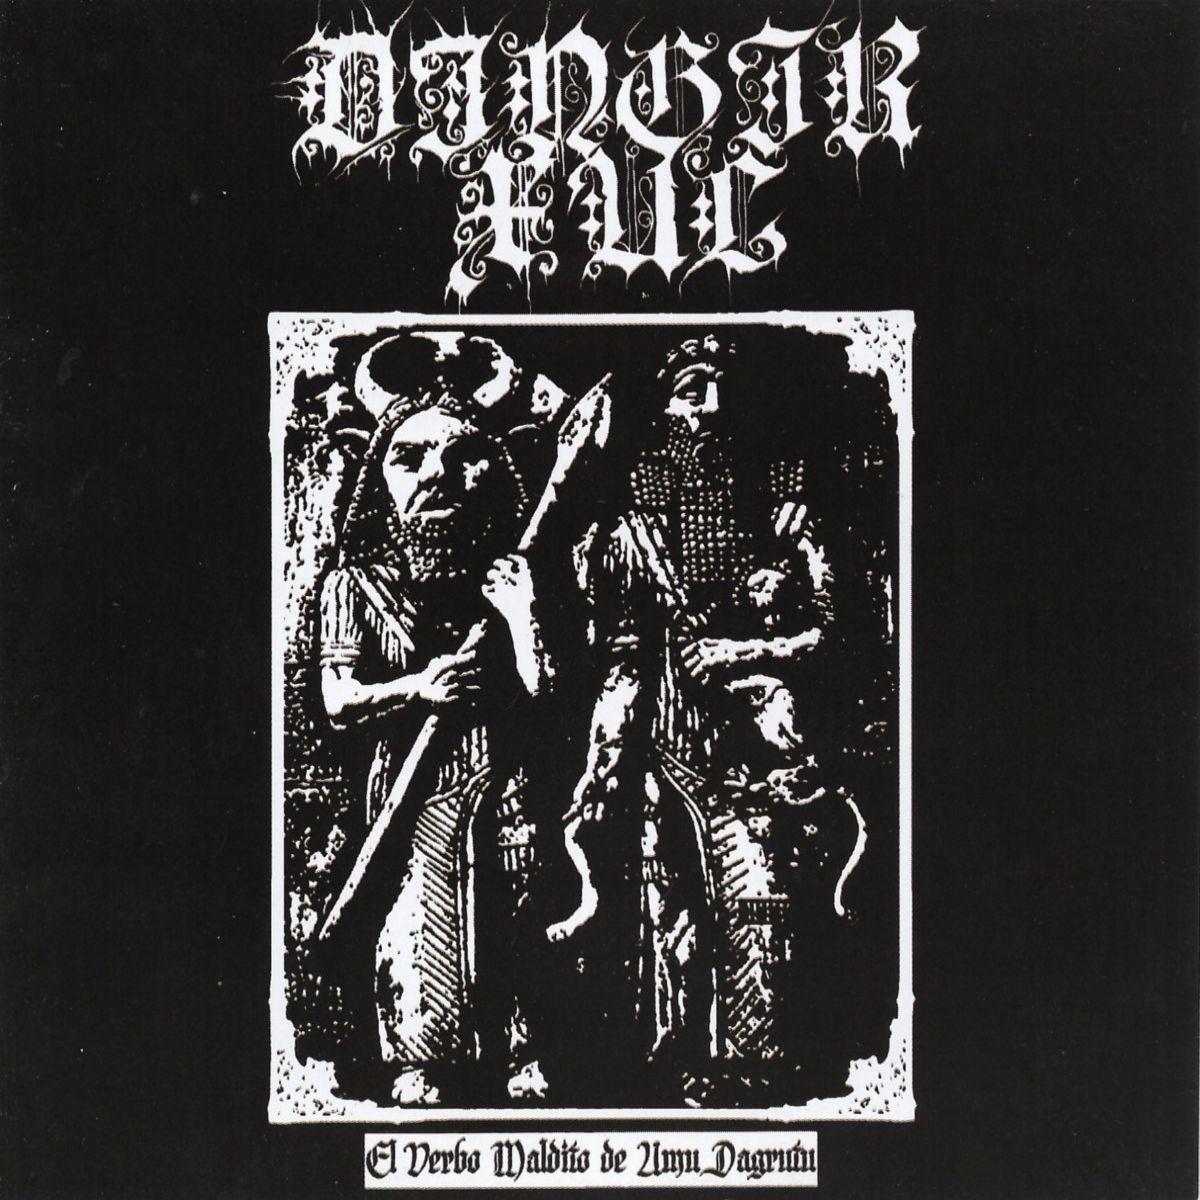 Dingir Xul (CHL) - El Verbo Maldito de Umu Dagrutu